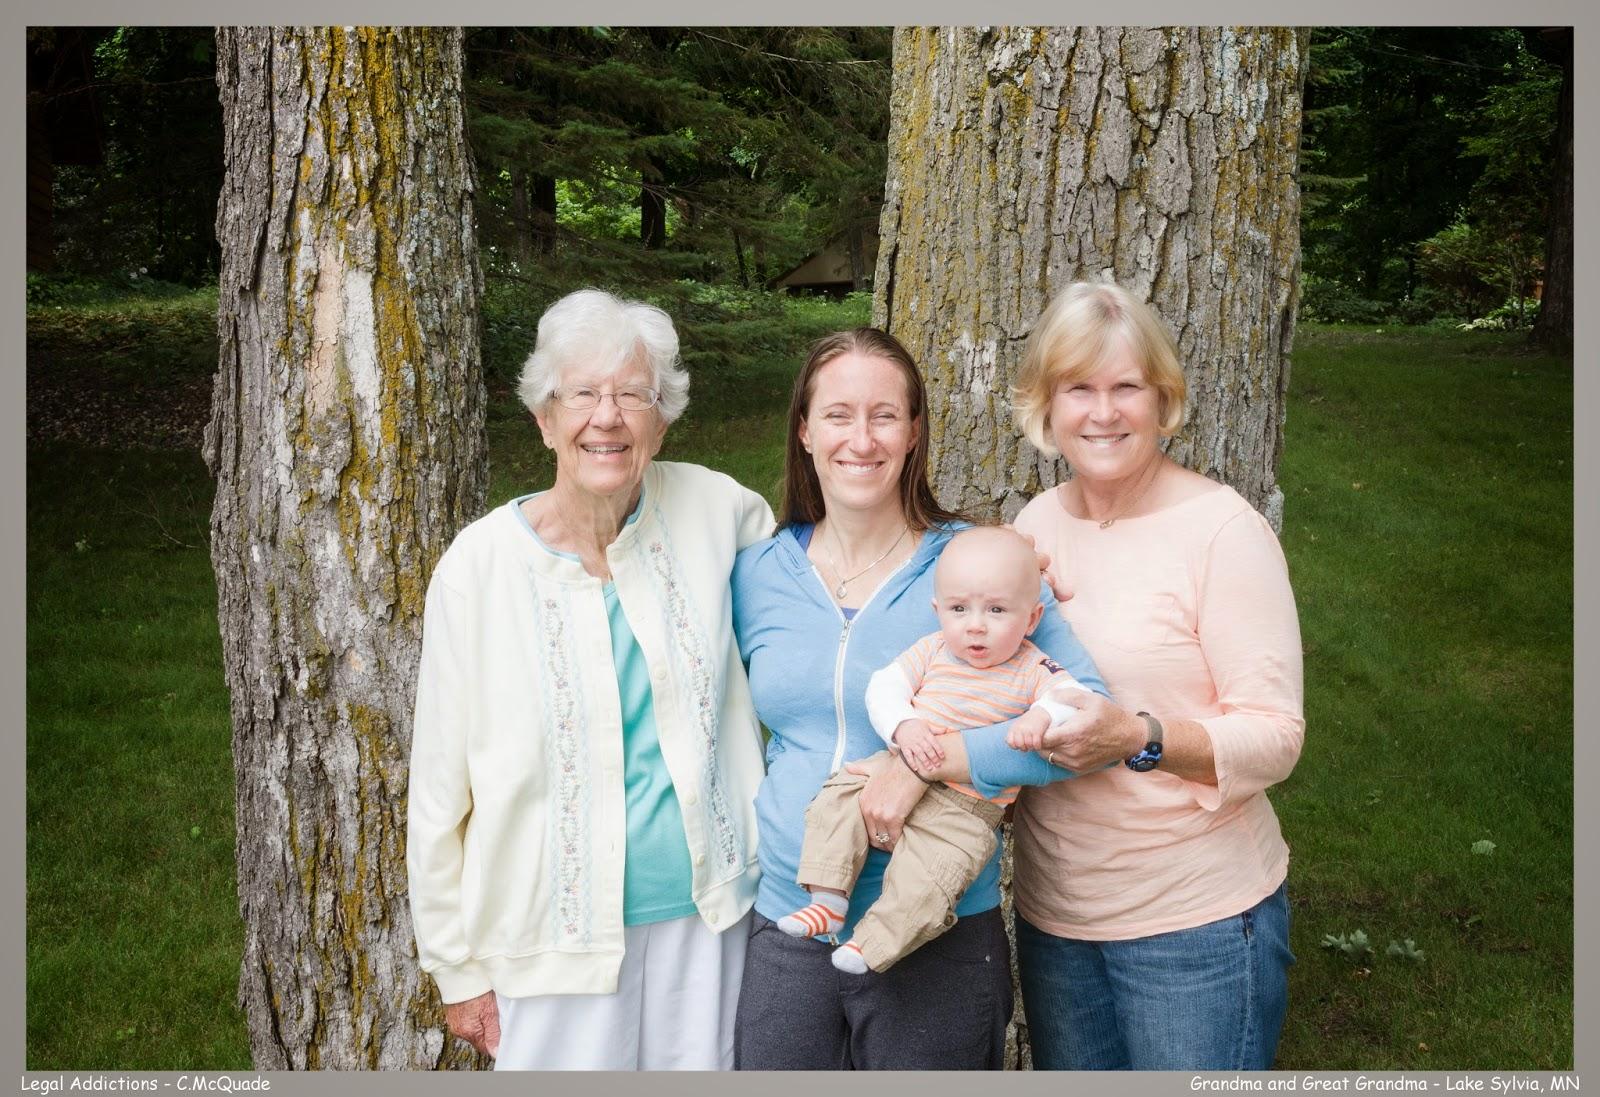 grandma+and+great+grandma-20144592.jpg